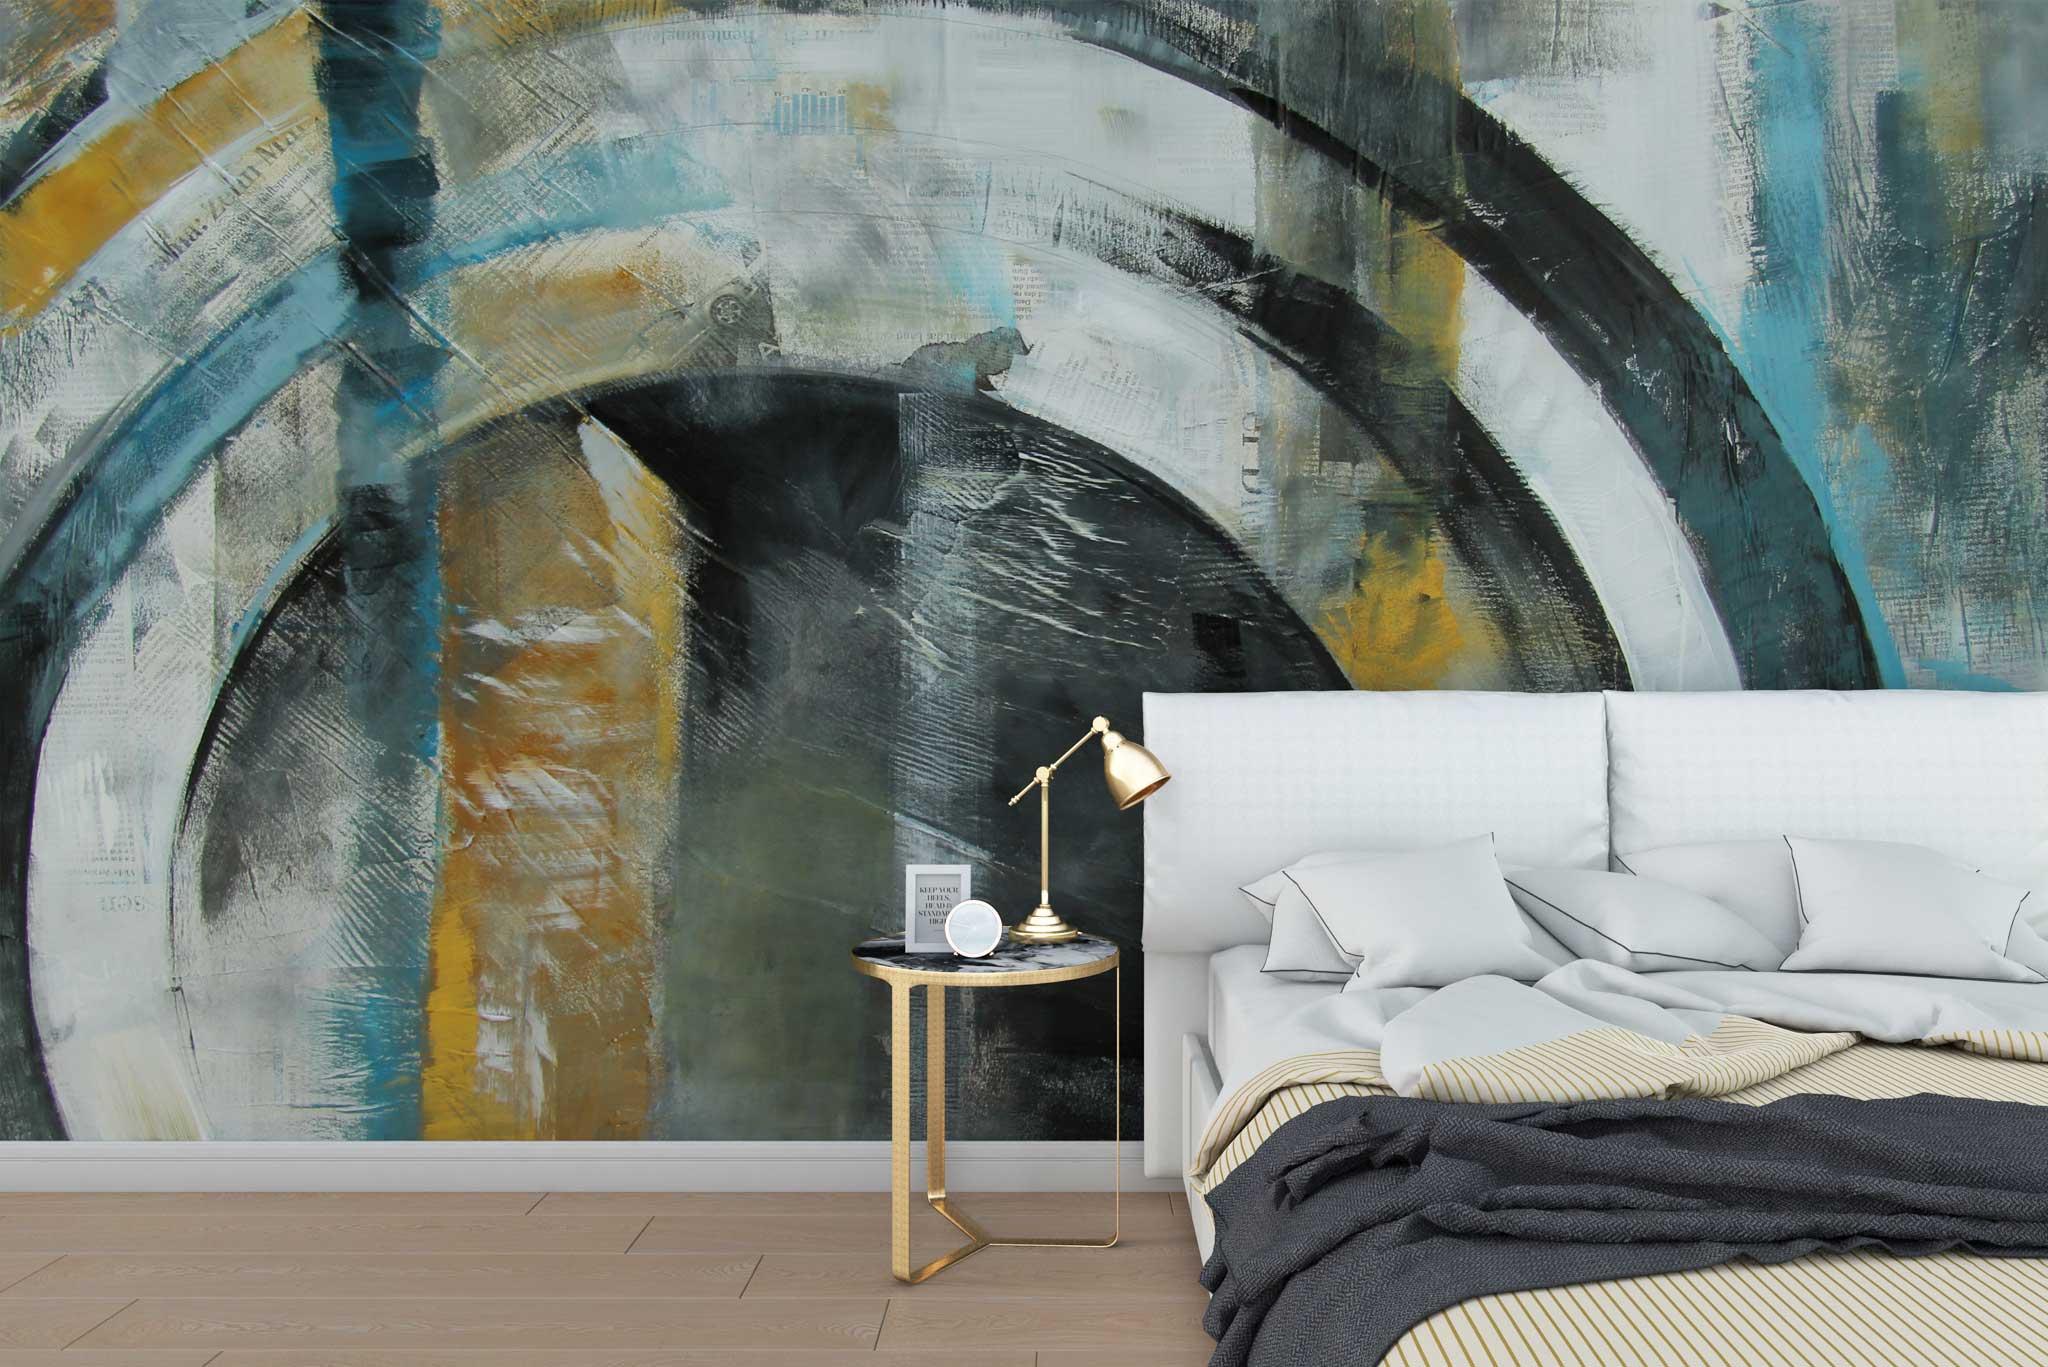 tapet-fototapet-special-personalizat-customizabil-comanda-bucuresti-daring-prints-model-pictura-contemporana-abstracta-industrial-grunge-cercuri-albastru-galben